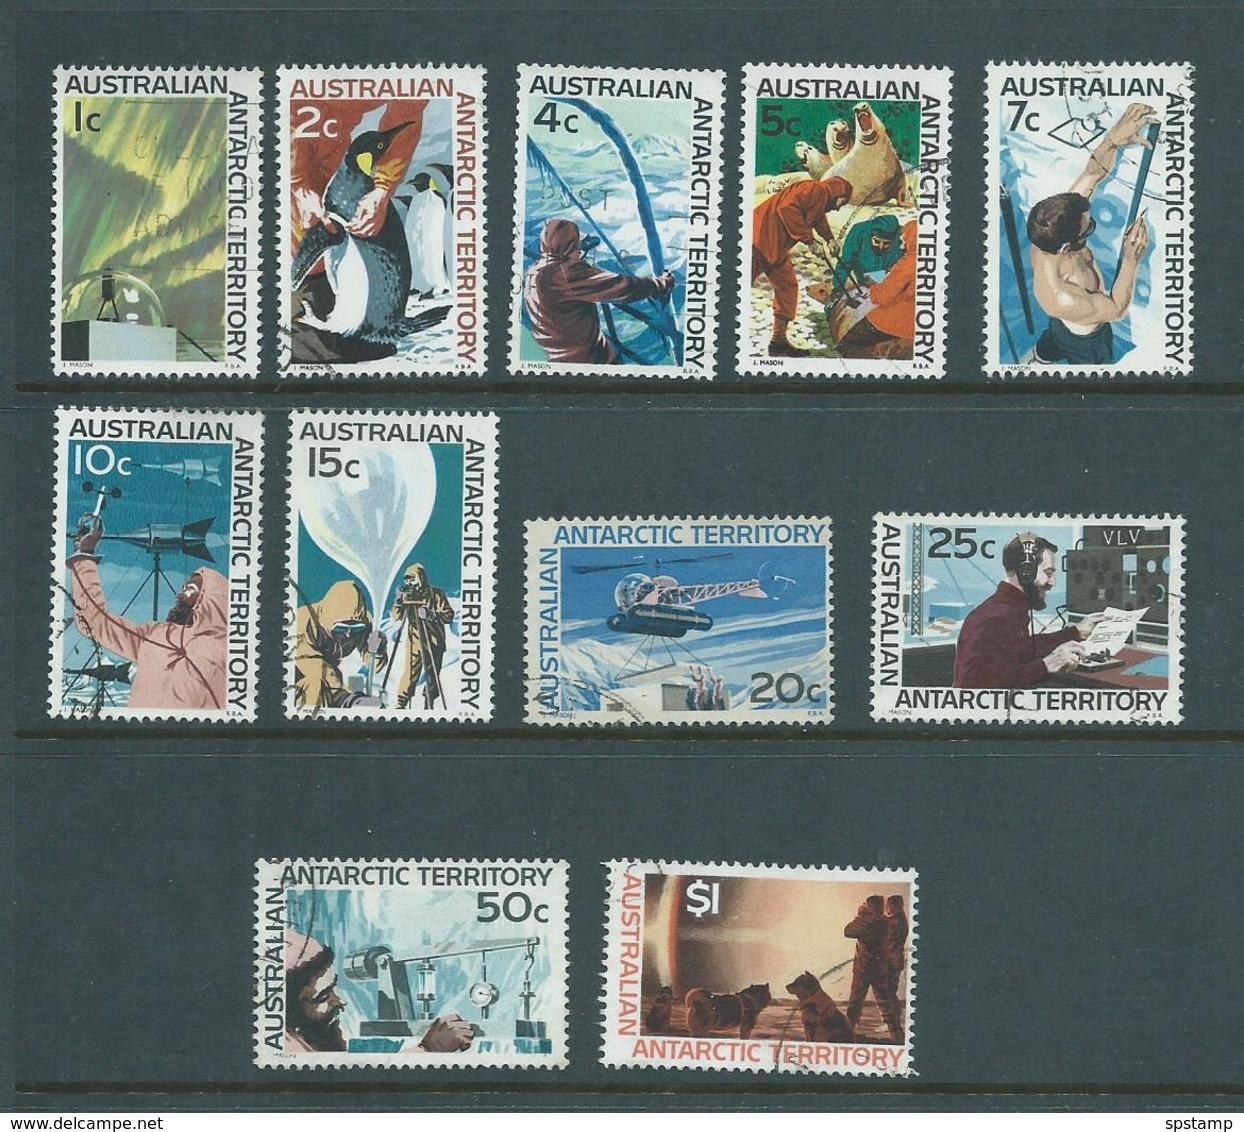 Australian Antarctic Territory 1966 Definitive Scenes Set 11 FU , 2 Lower Values Small Faults - Unused Stamps